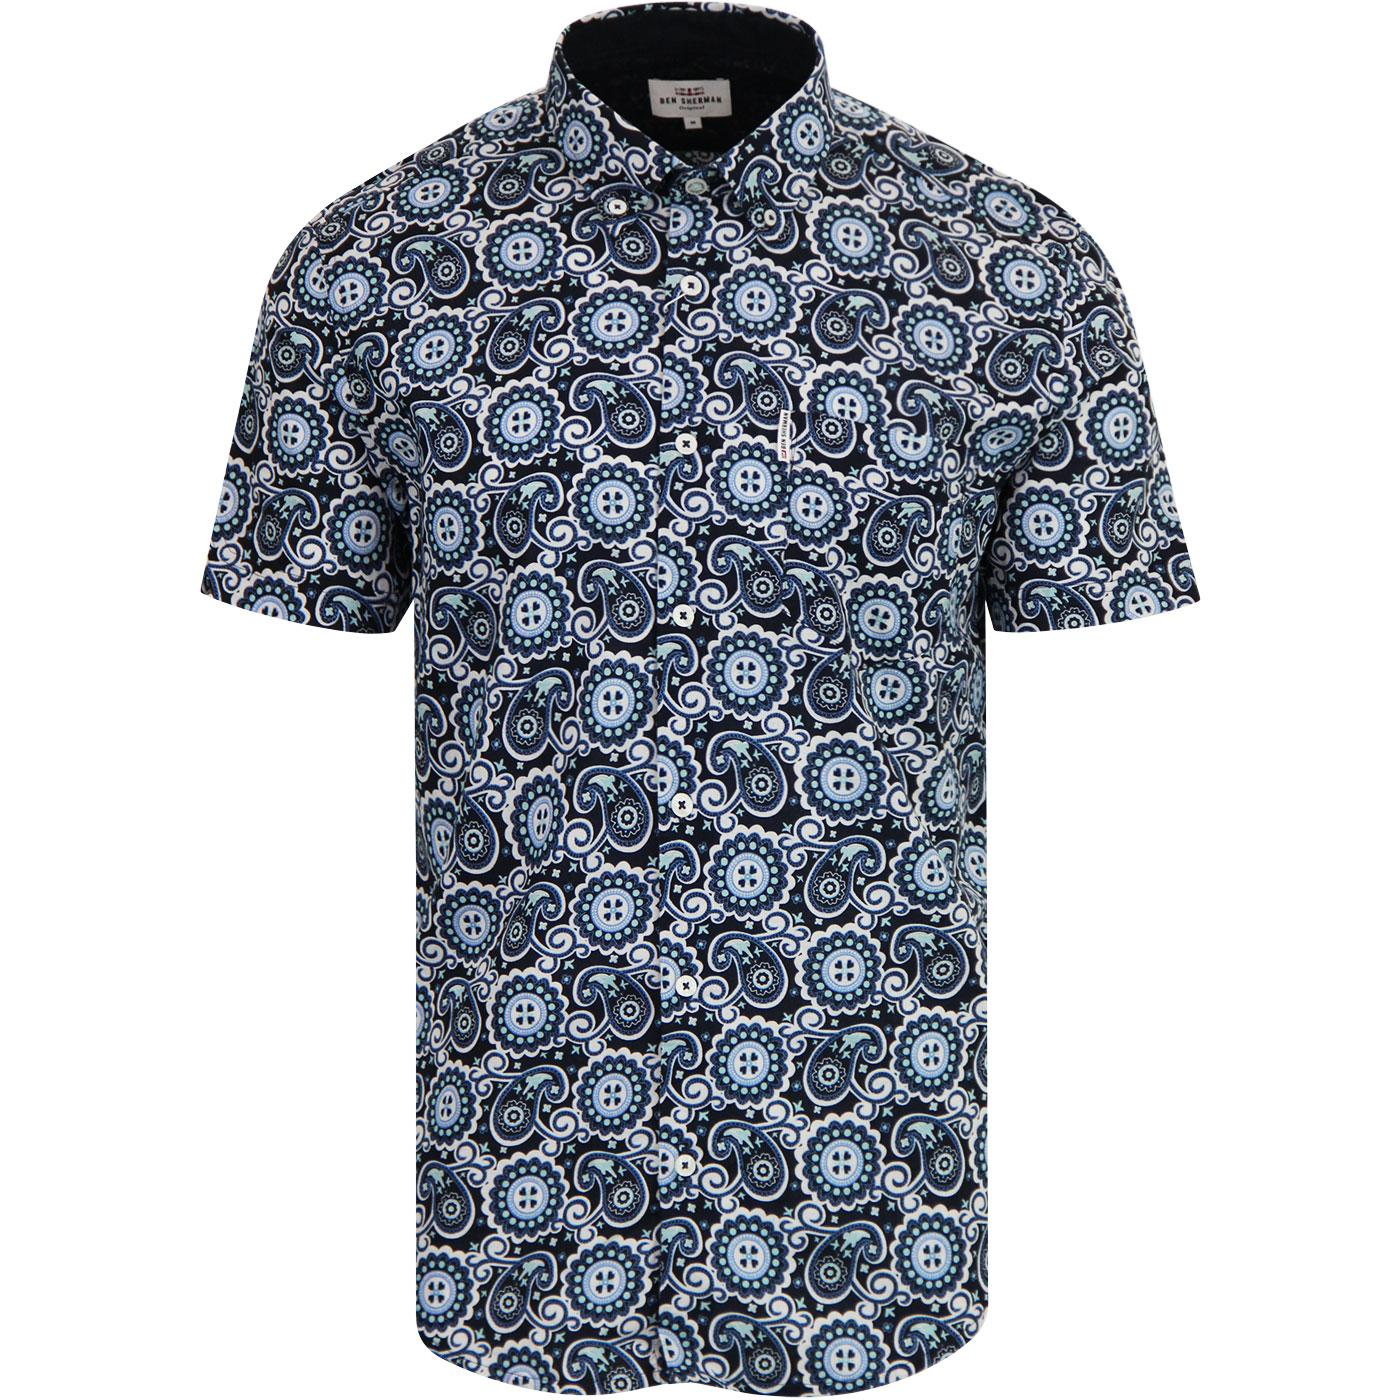 BEN SHERMAN Retro Paisley Print Shirt DARK BLUE